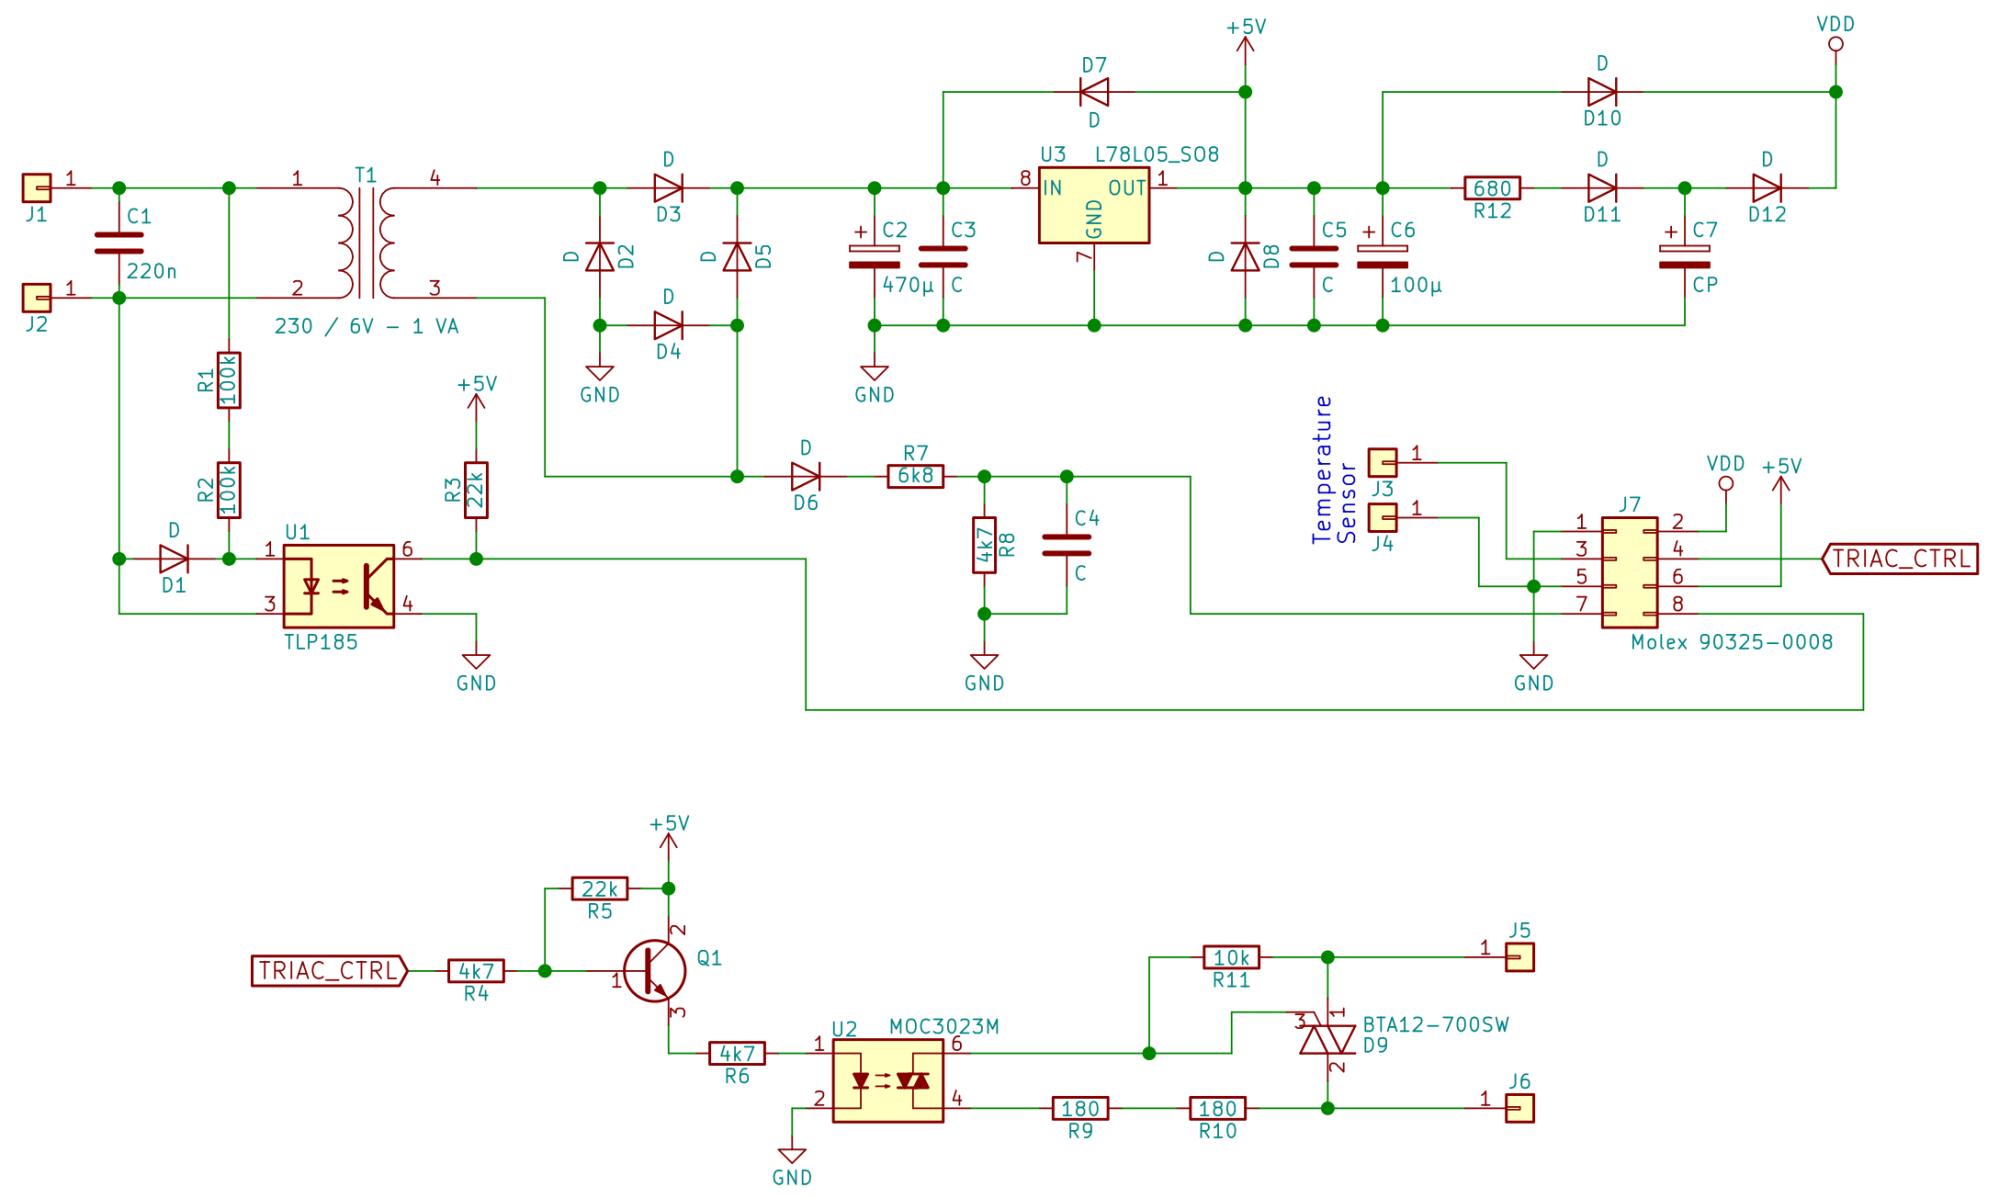 hight resolution of schematic of heater power board control triac reverse engineering zero crossing